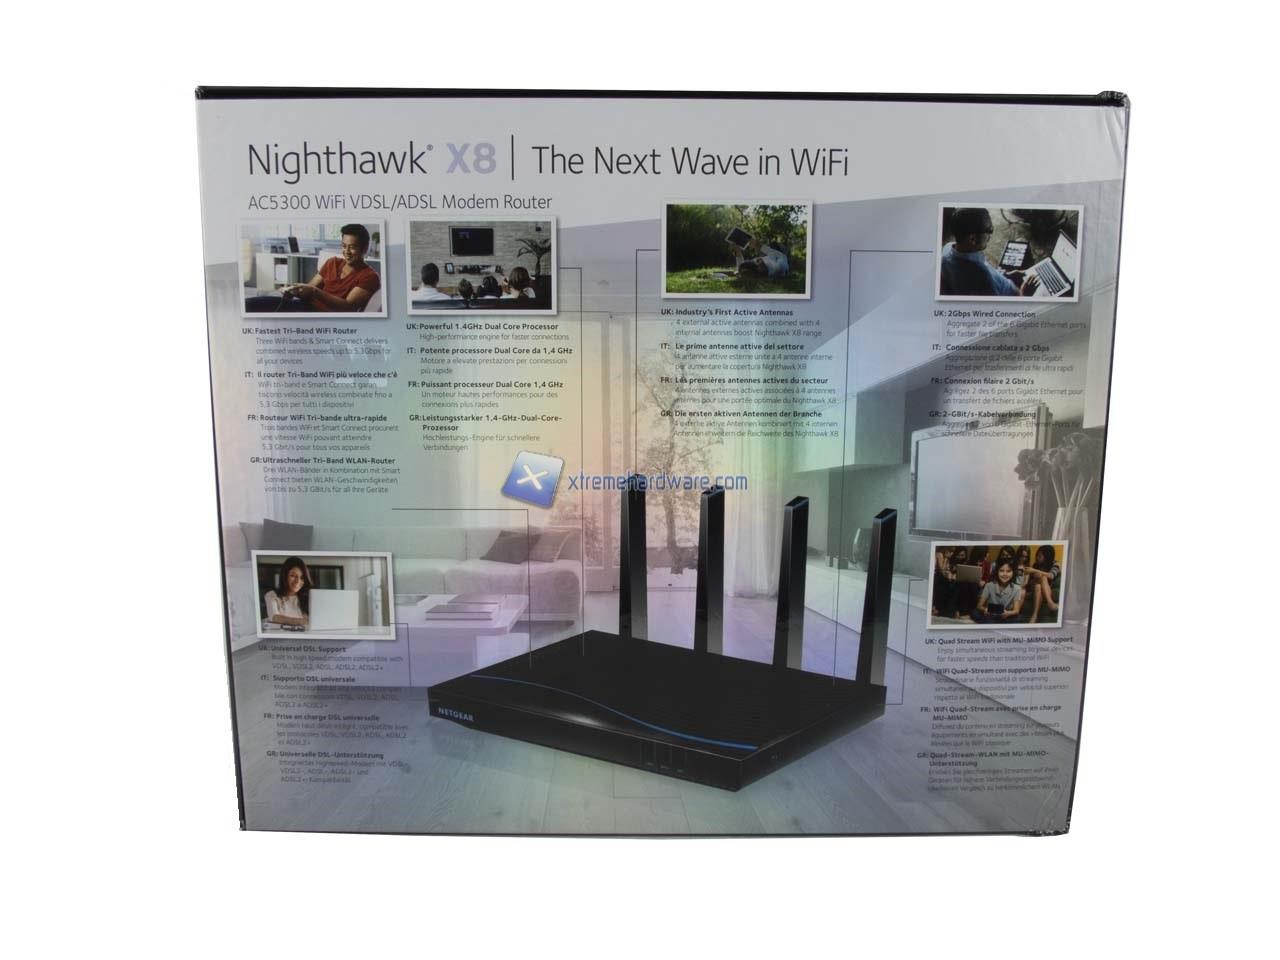 netgear nighthawk x8 manual